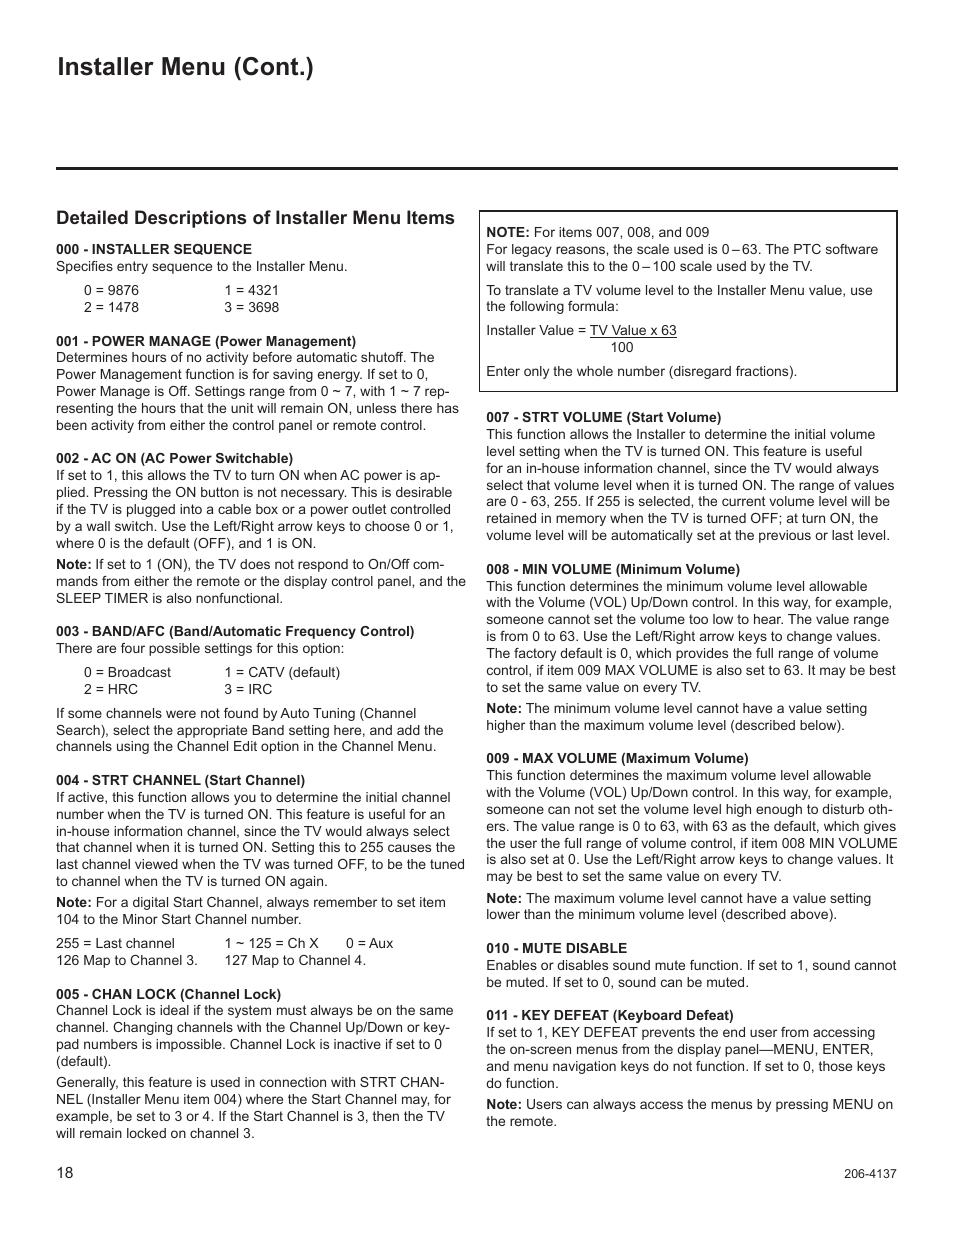 Installer menu (cont ), Detailed descriptions of installer menu